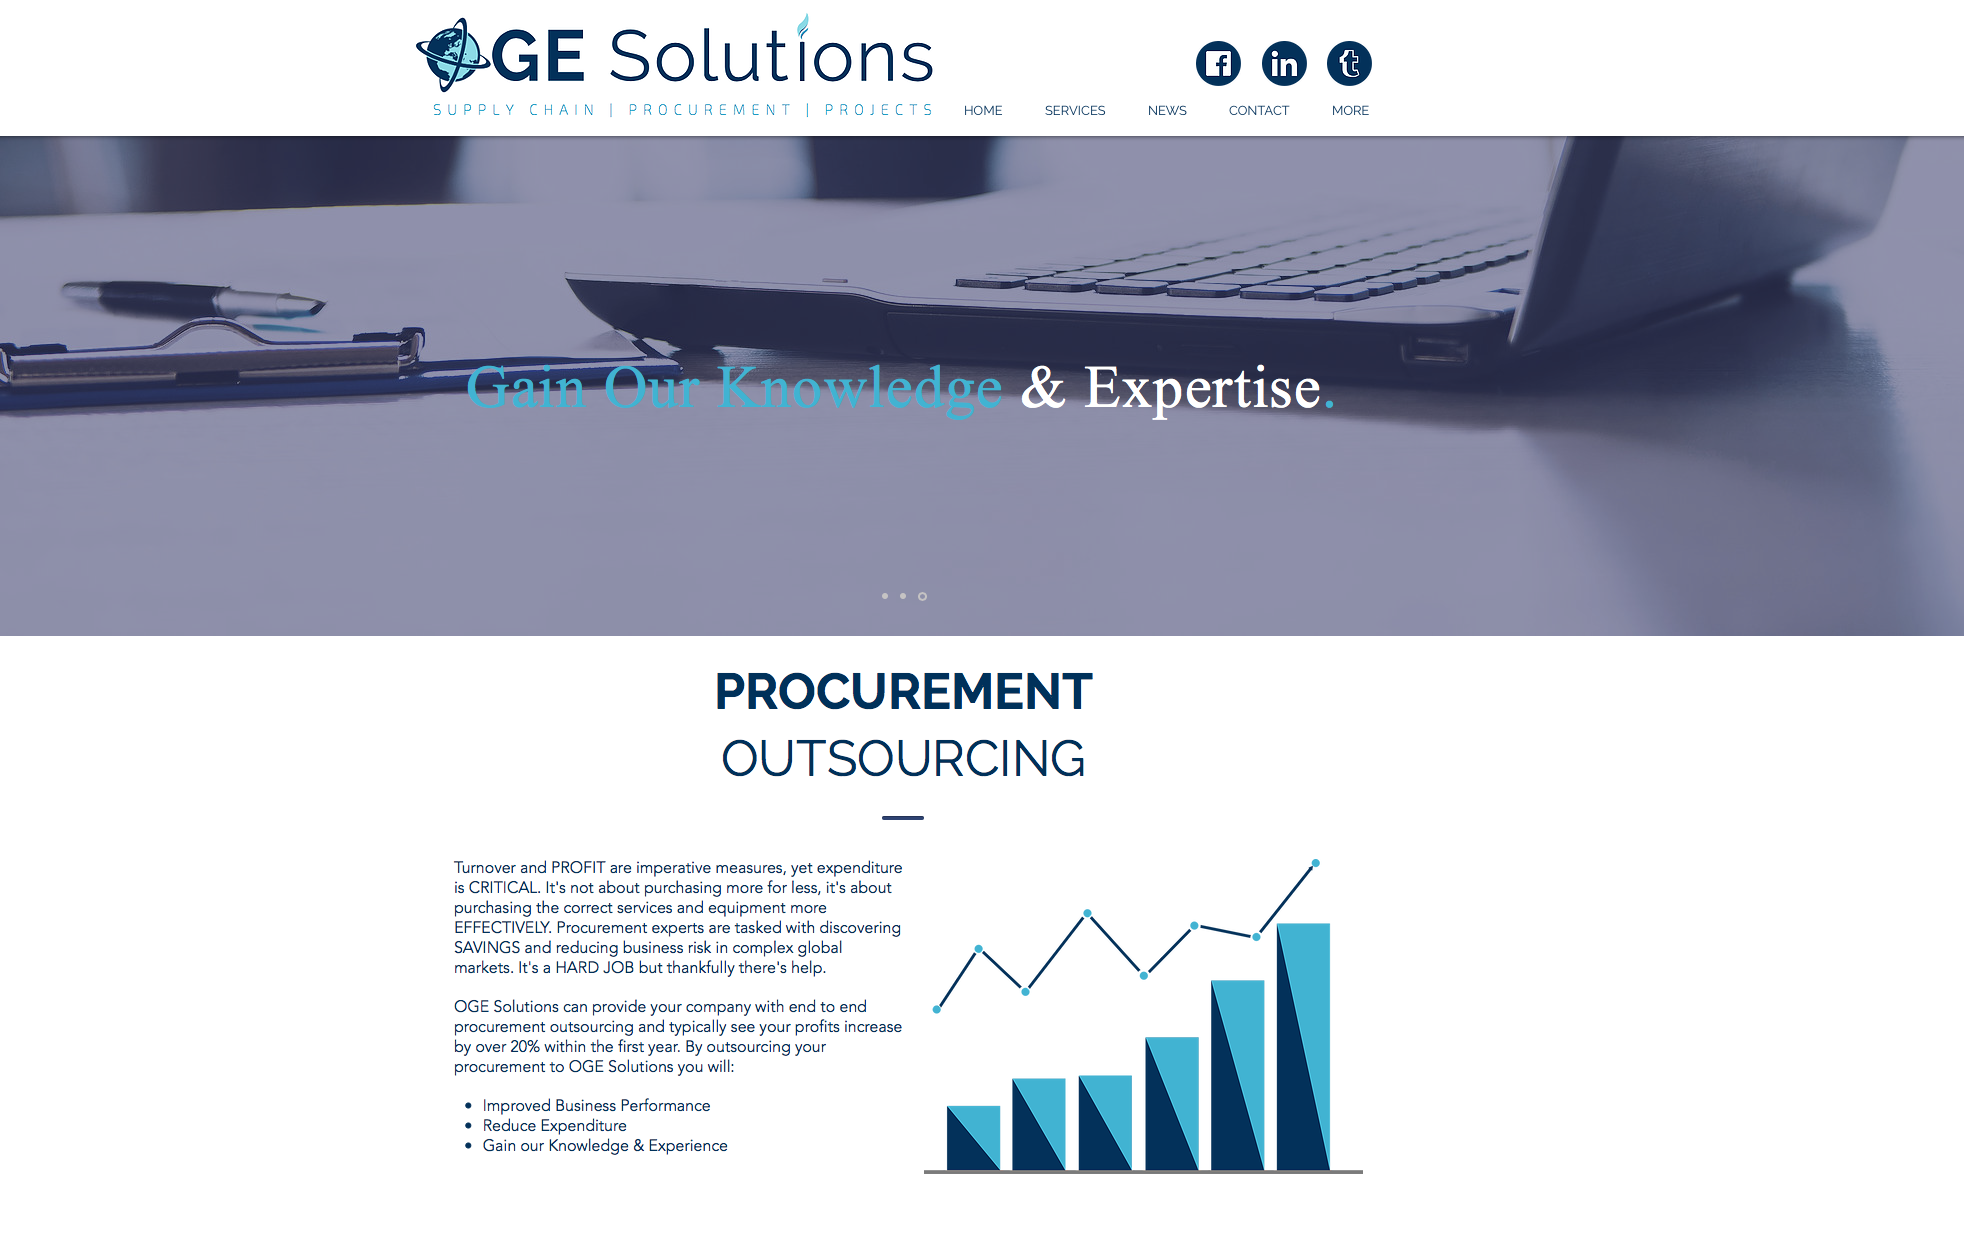 OGE Solutions Website by Bigger-Fish